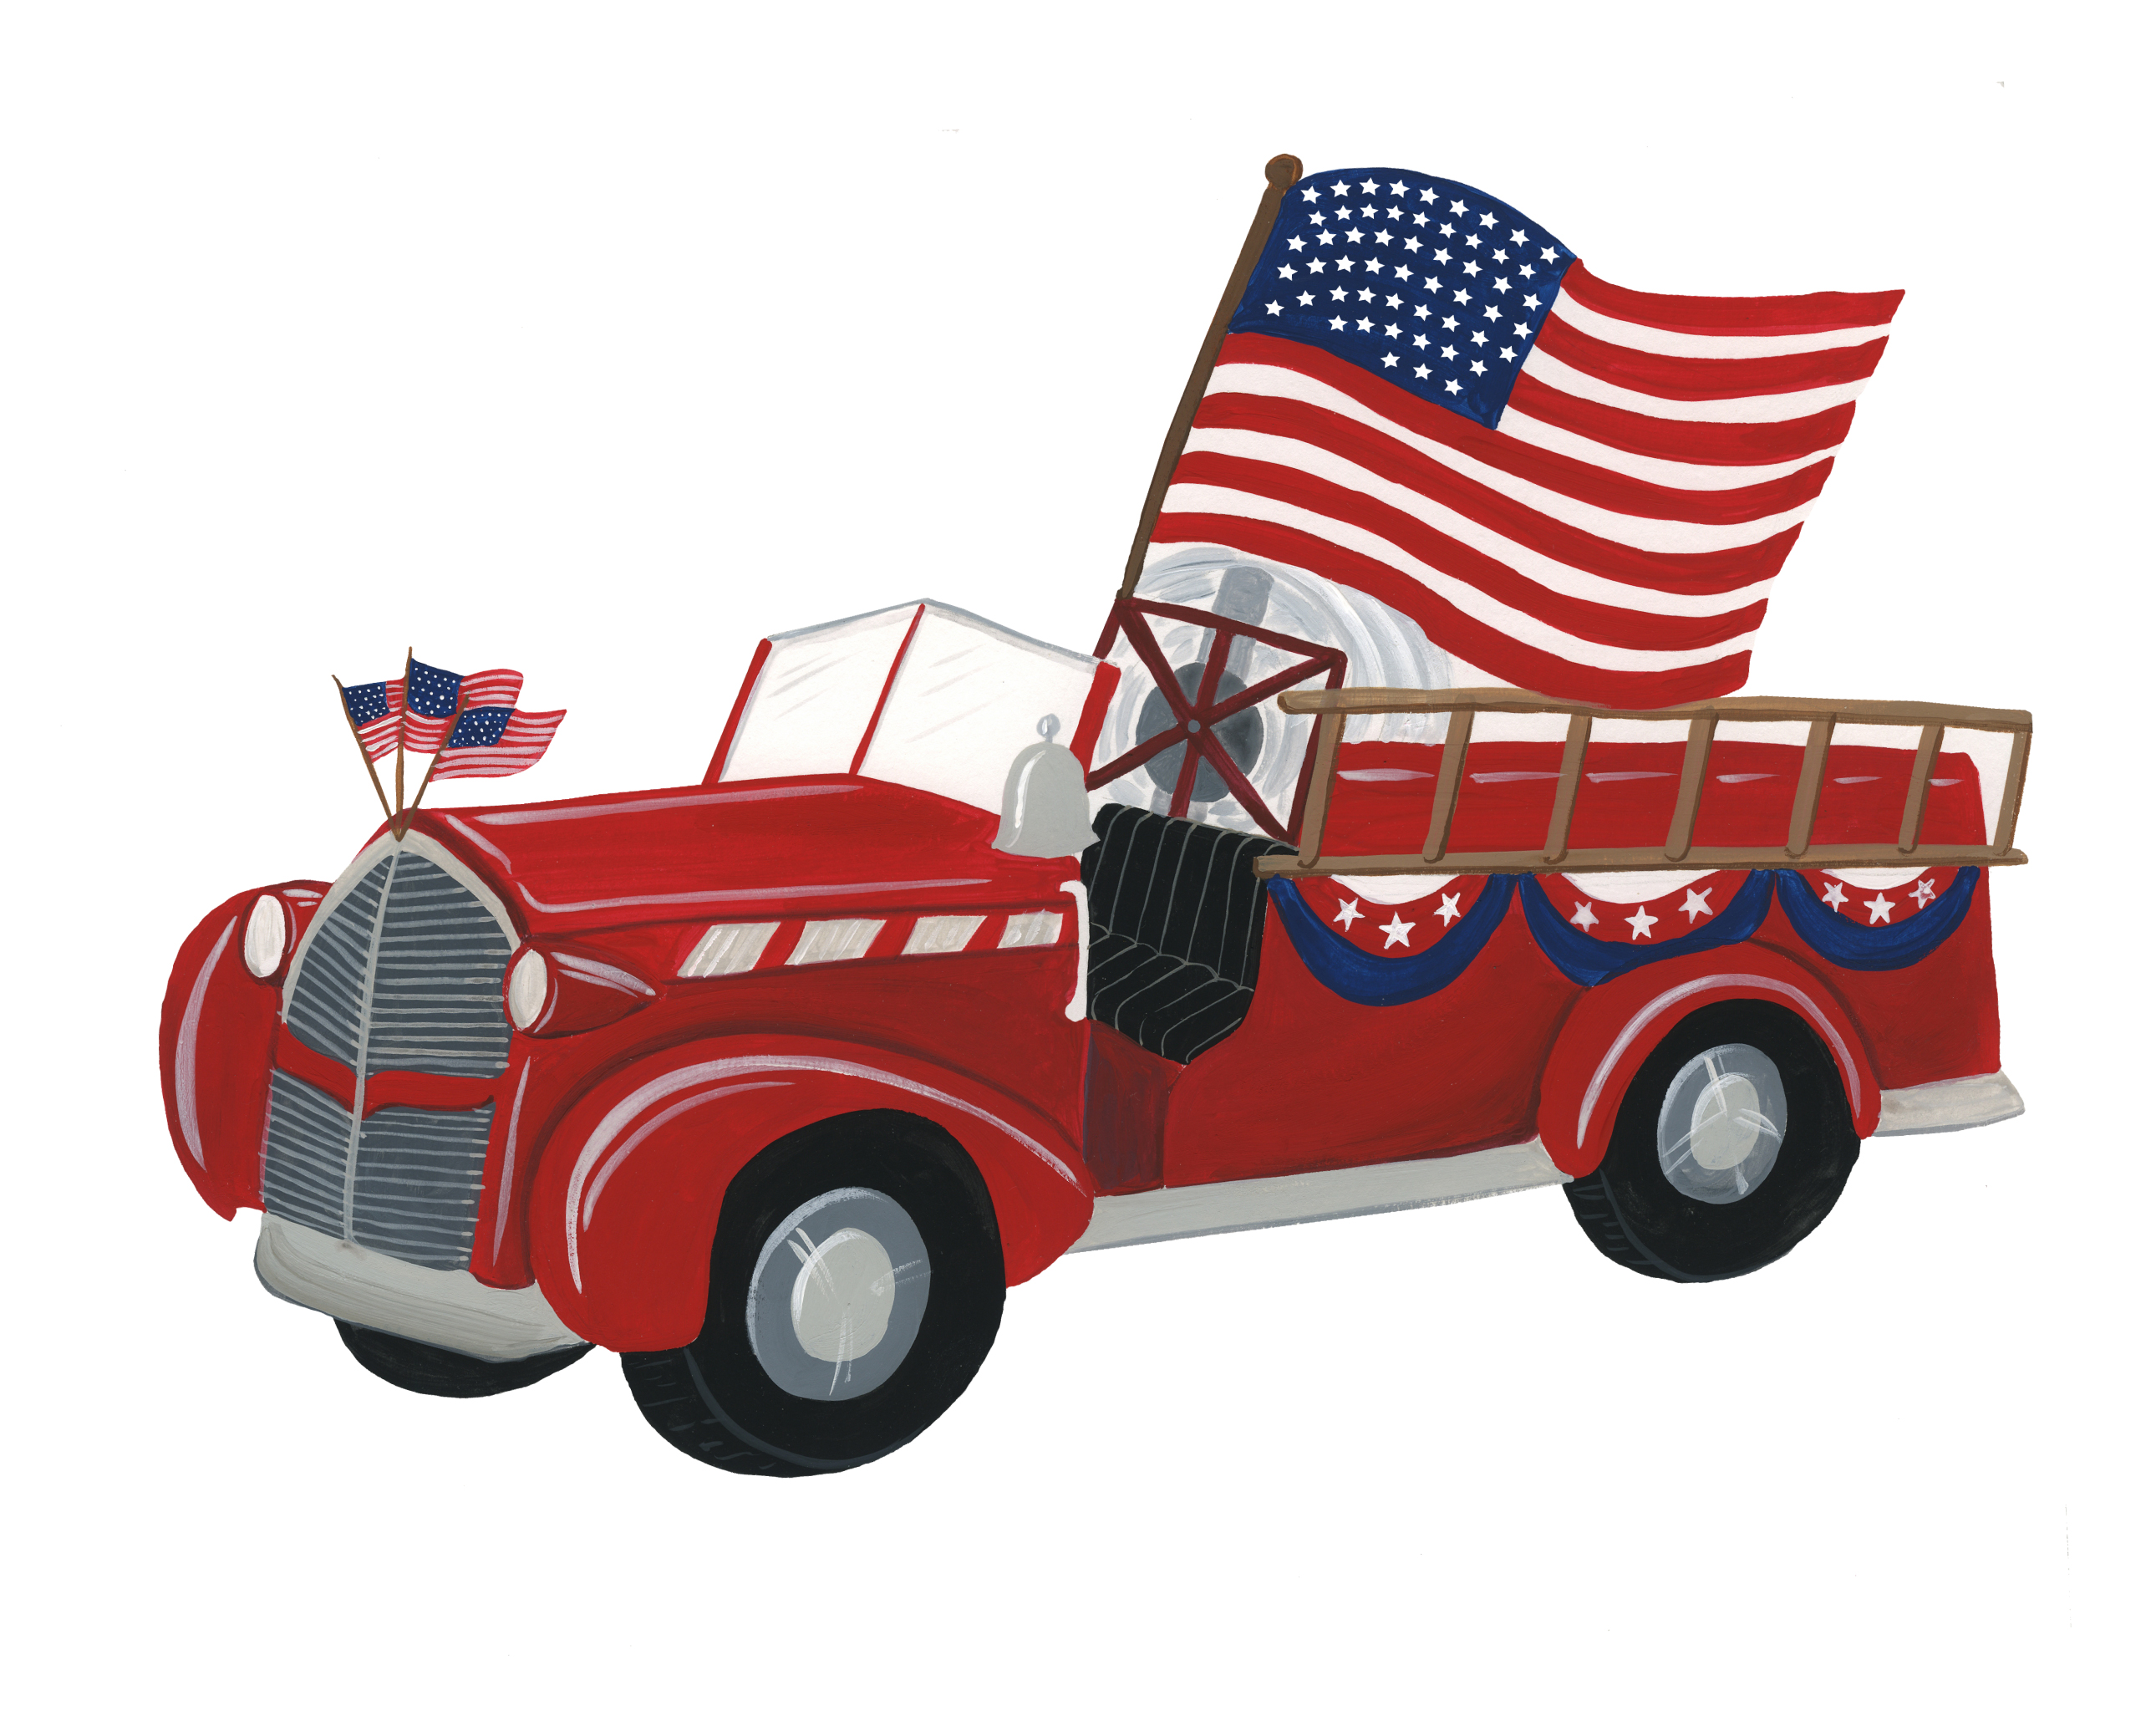 4th Of July Fire Truck Print & Cut File